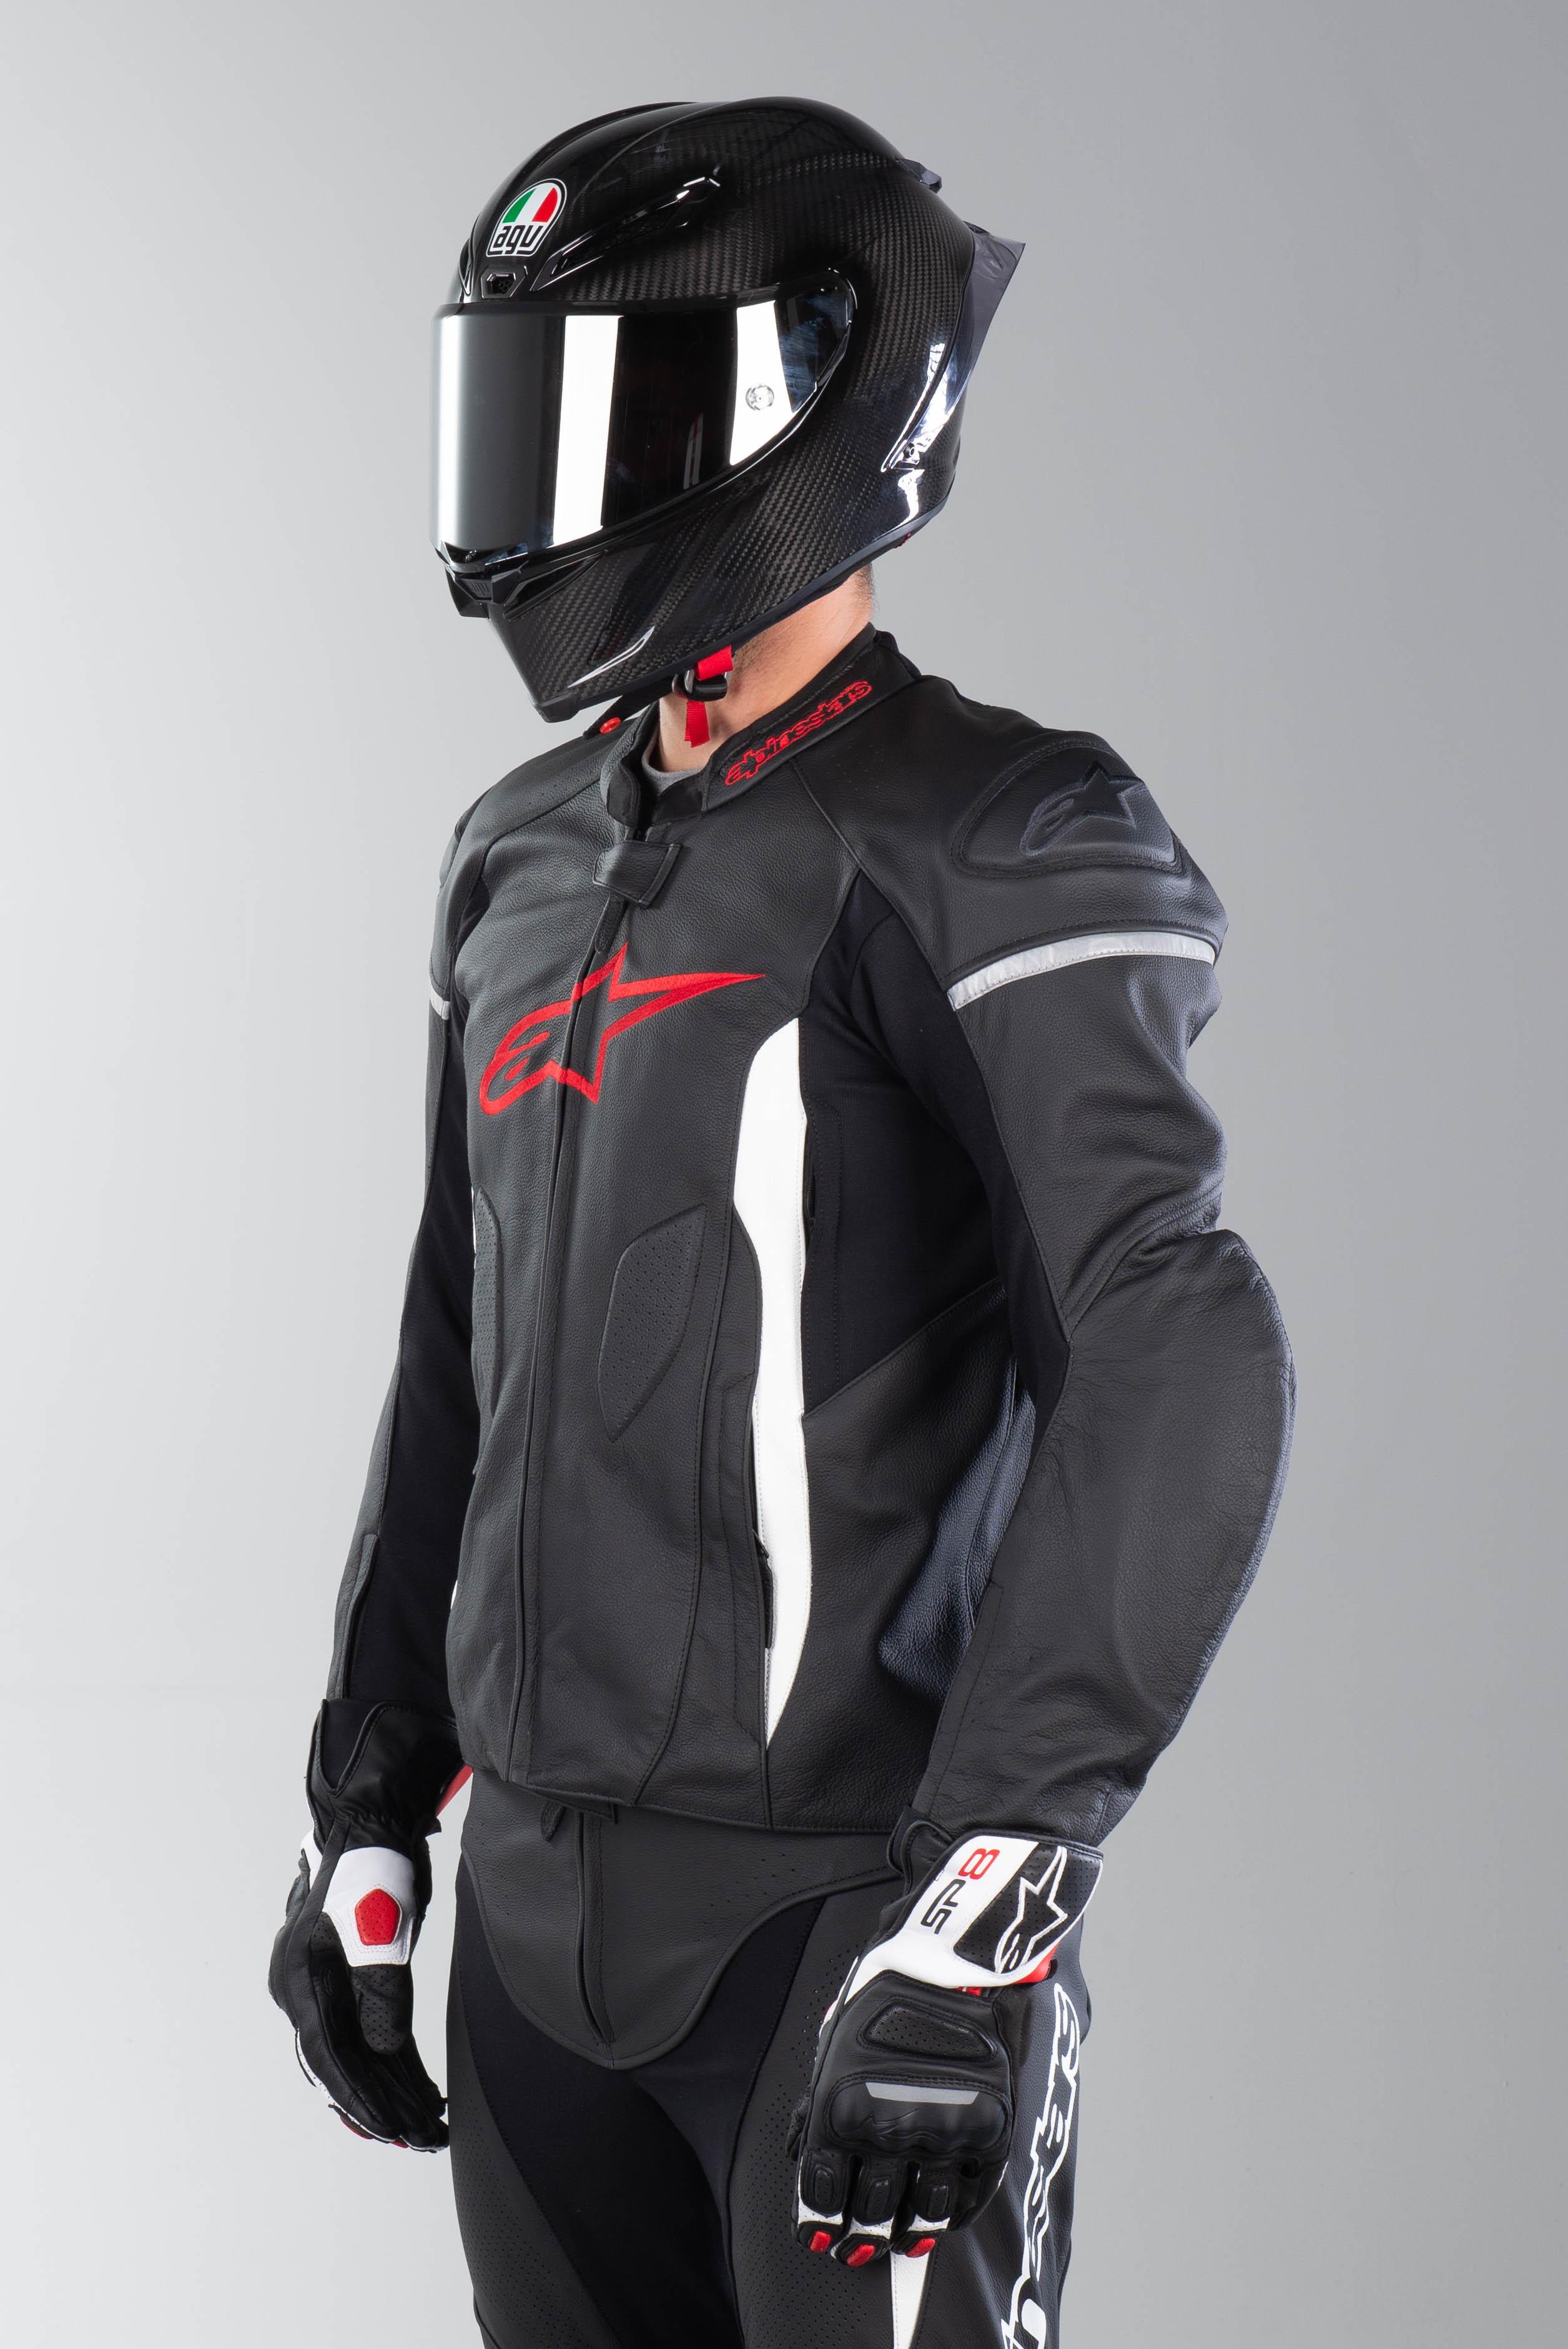 50 Alpinestars Faster nero//bianco//rosso Giacca in pelle